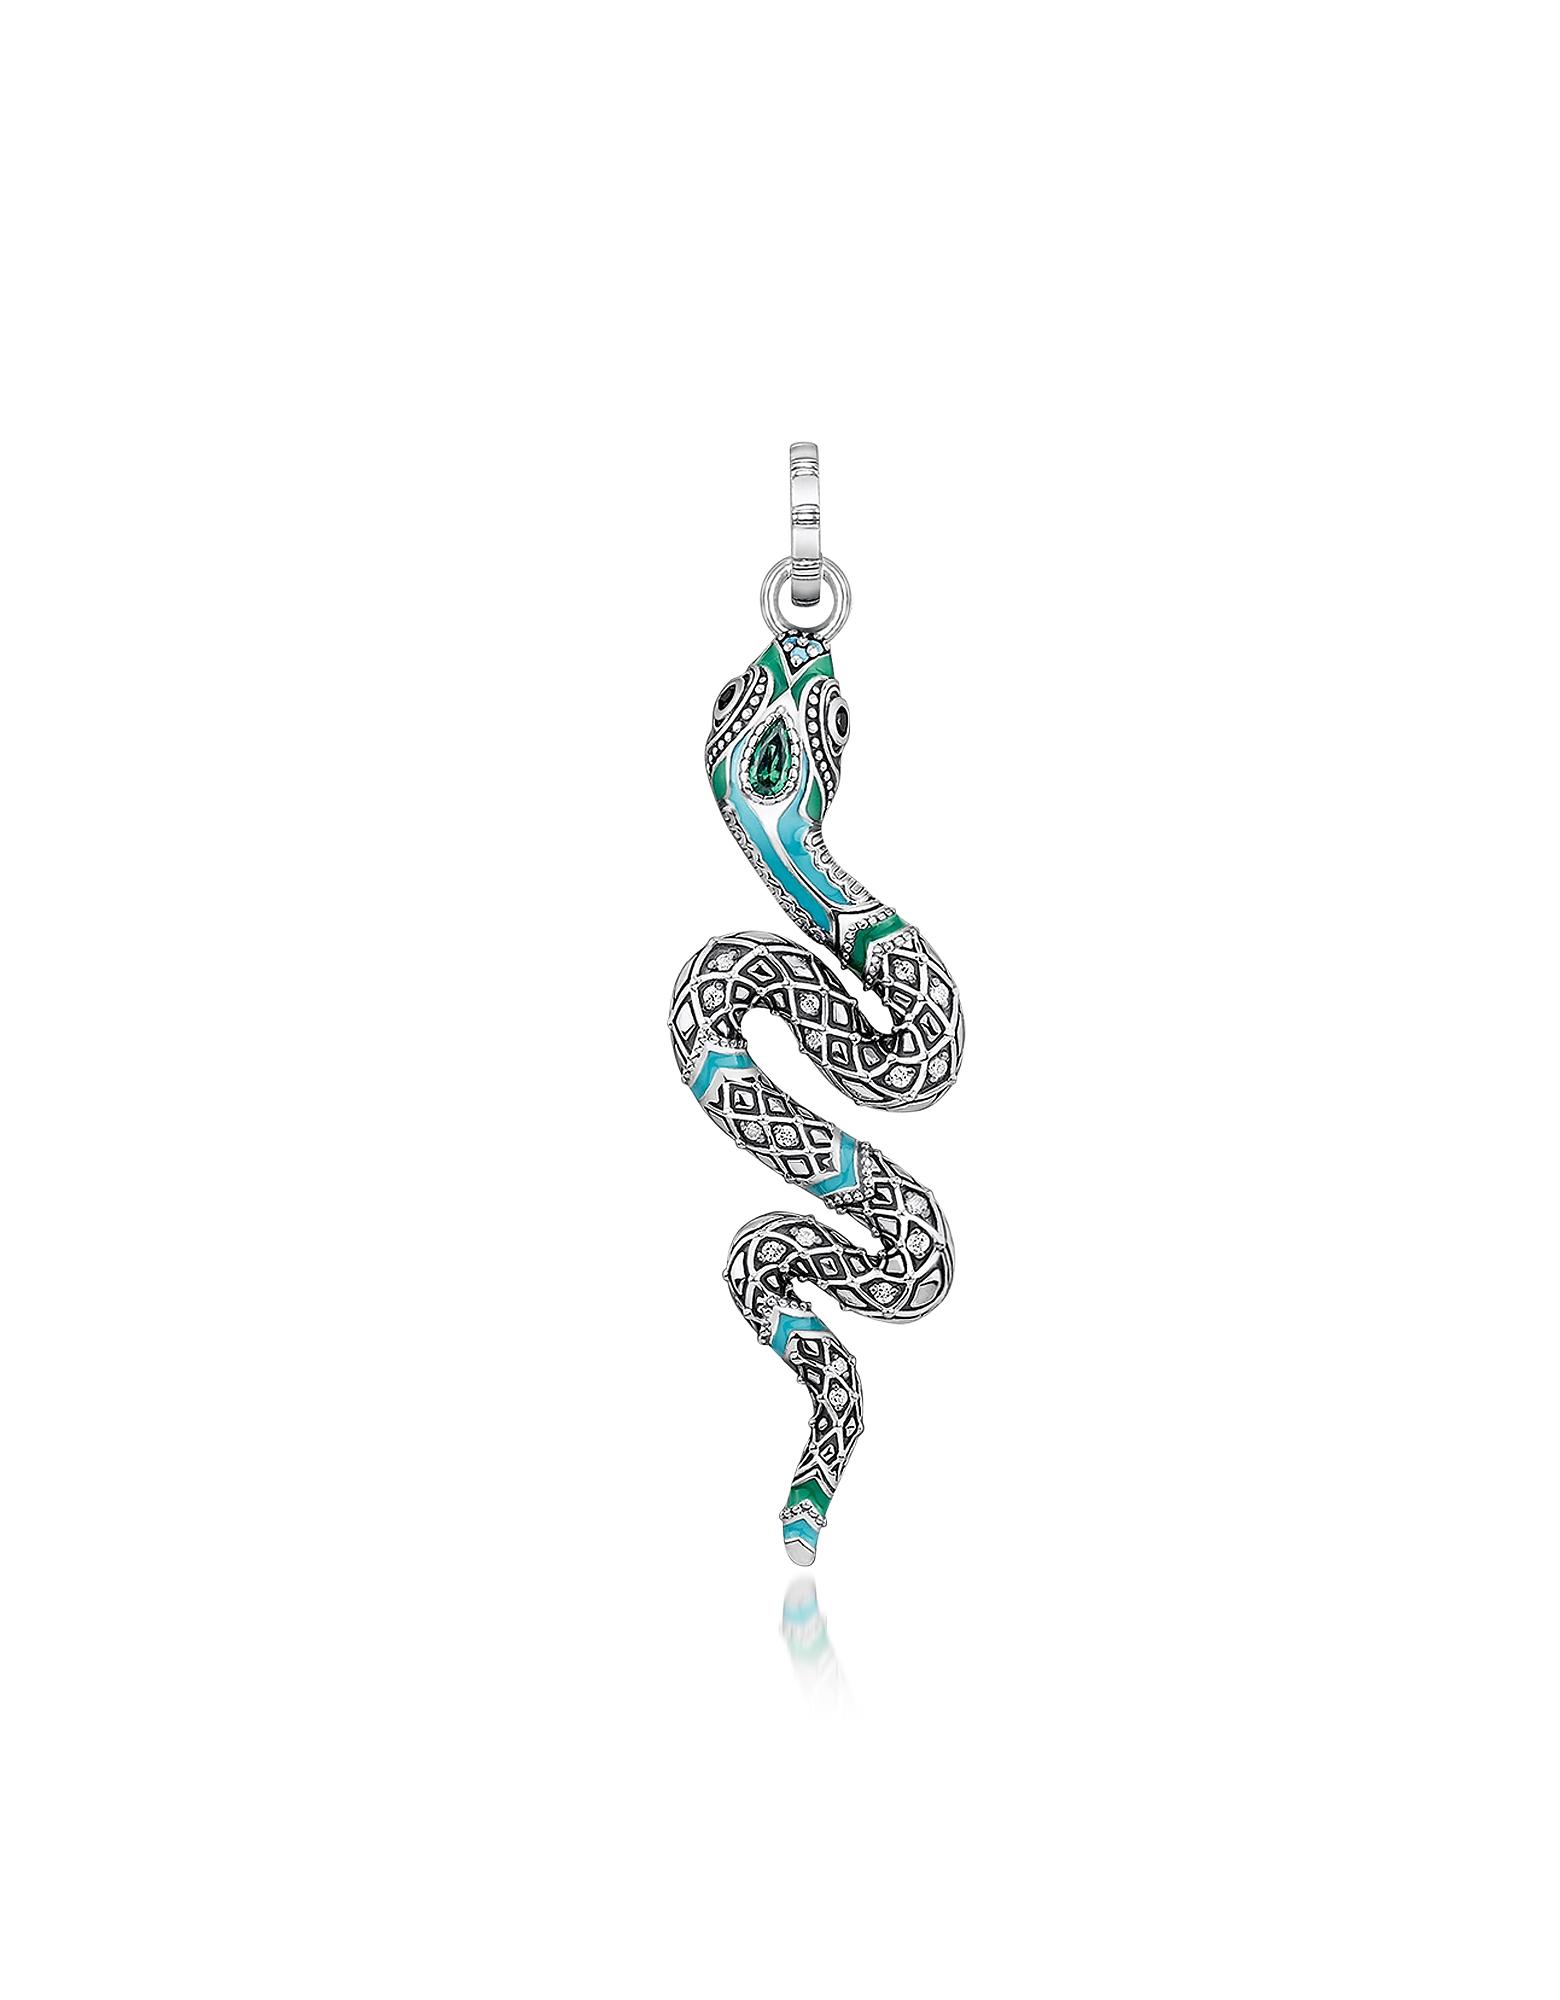 Thomas Sabo Necklaces, Blackened Sterling Silver, Enamel and Glass-ceramic Stones Snake Pendant